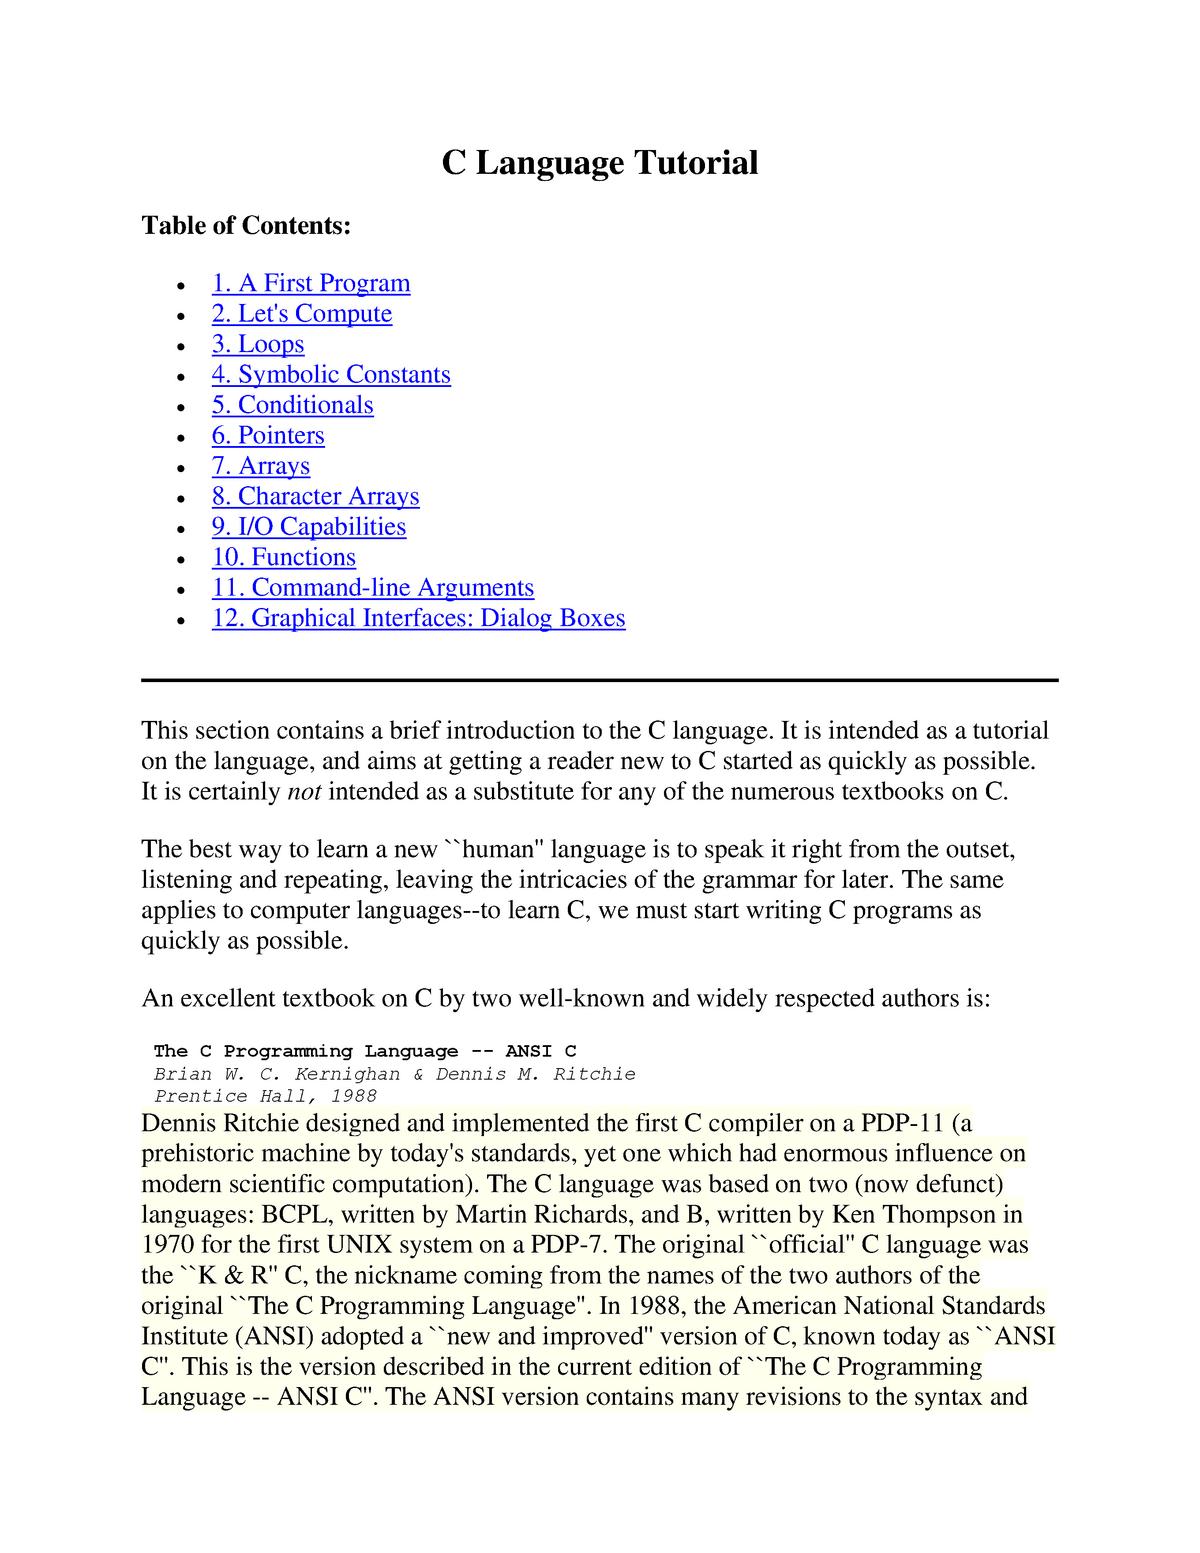 The C Programming Language - StuDocu Summary Library - StuDocu